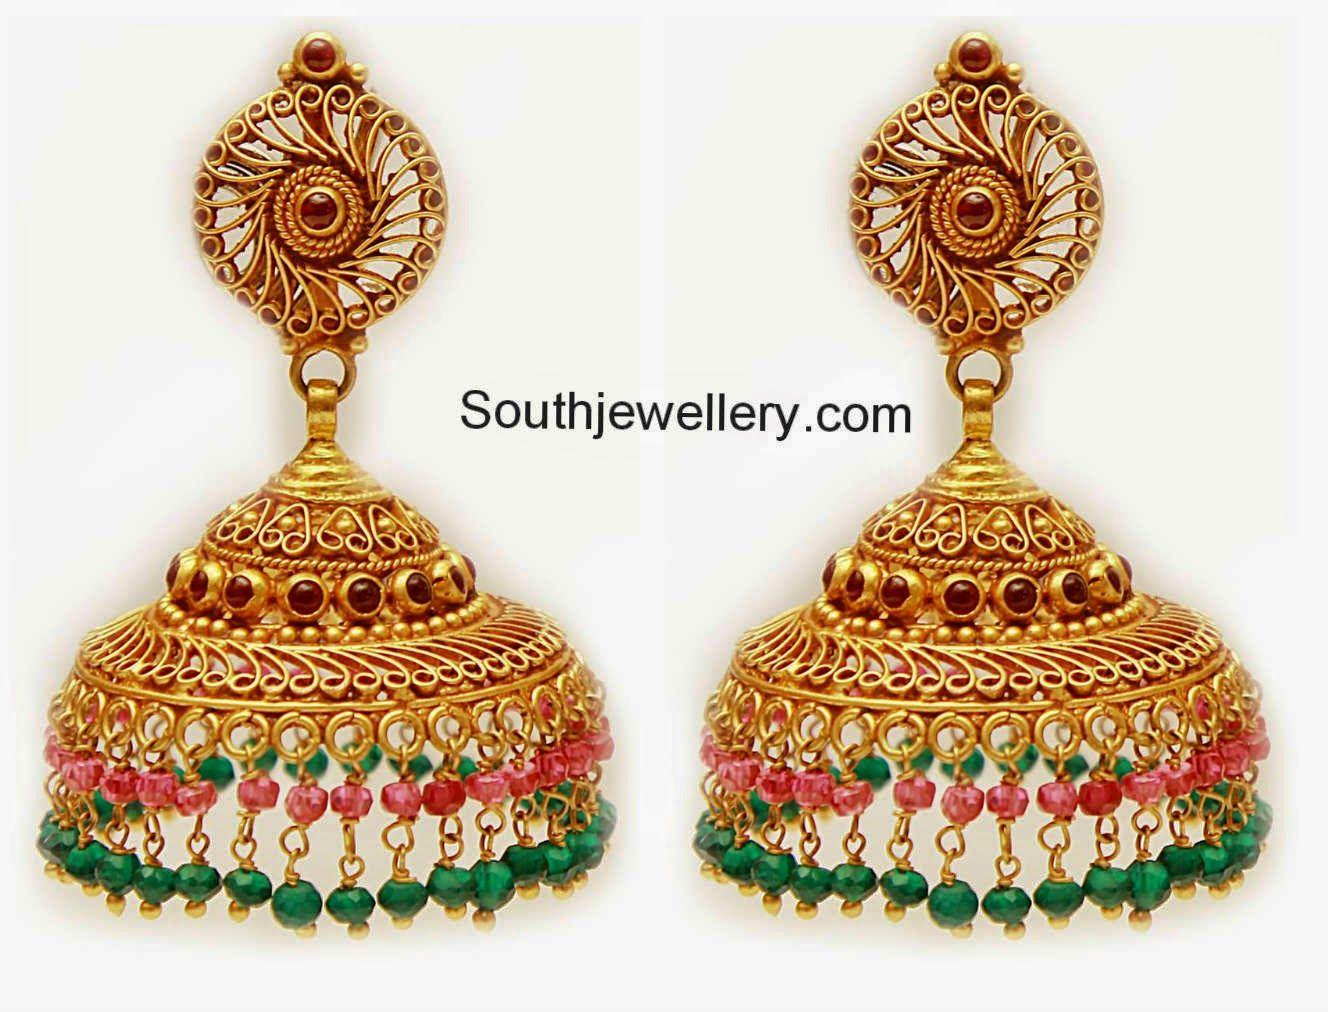 gold jhumkas | Southjewellery.com - Latest Indian Jewellery ...